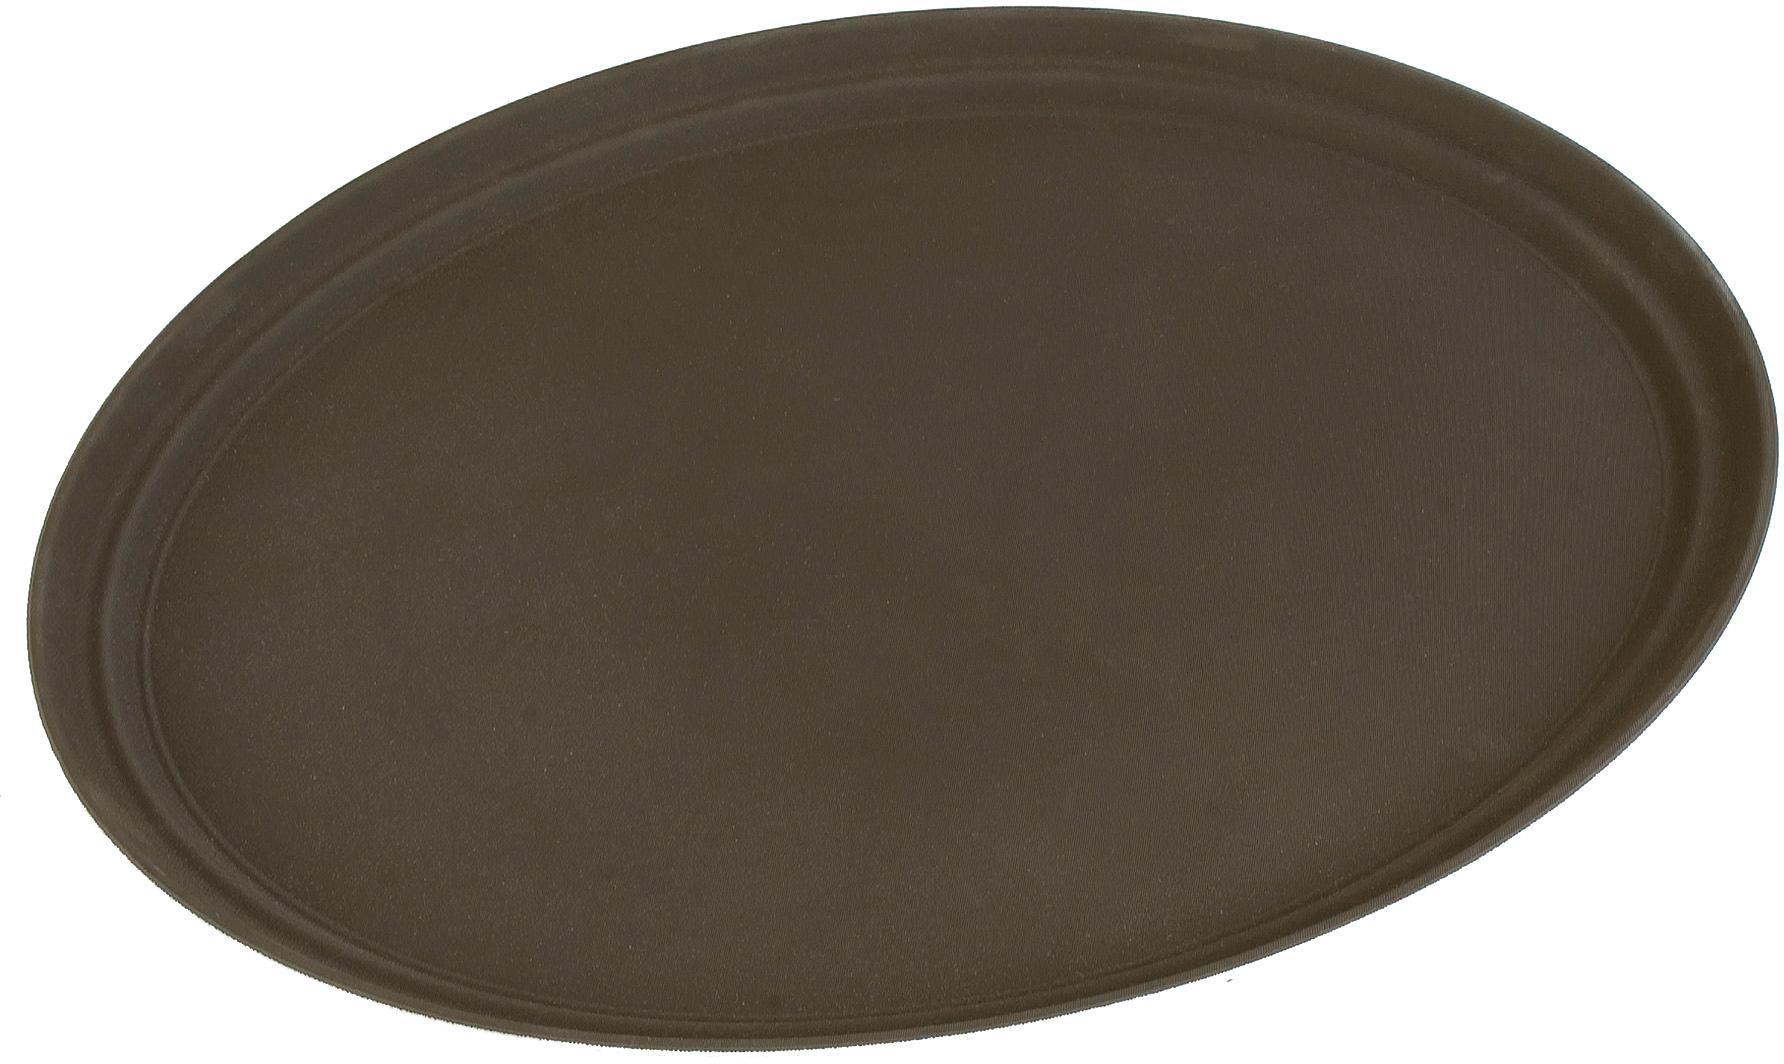 Truebasics Oval Grip Tray 27 x 22 - Toffee Tan